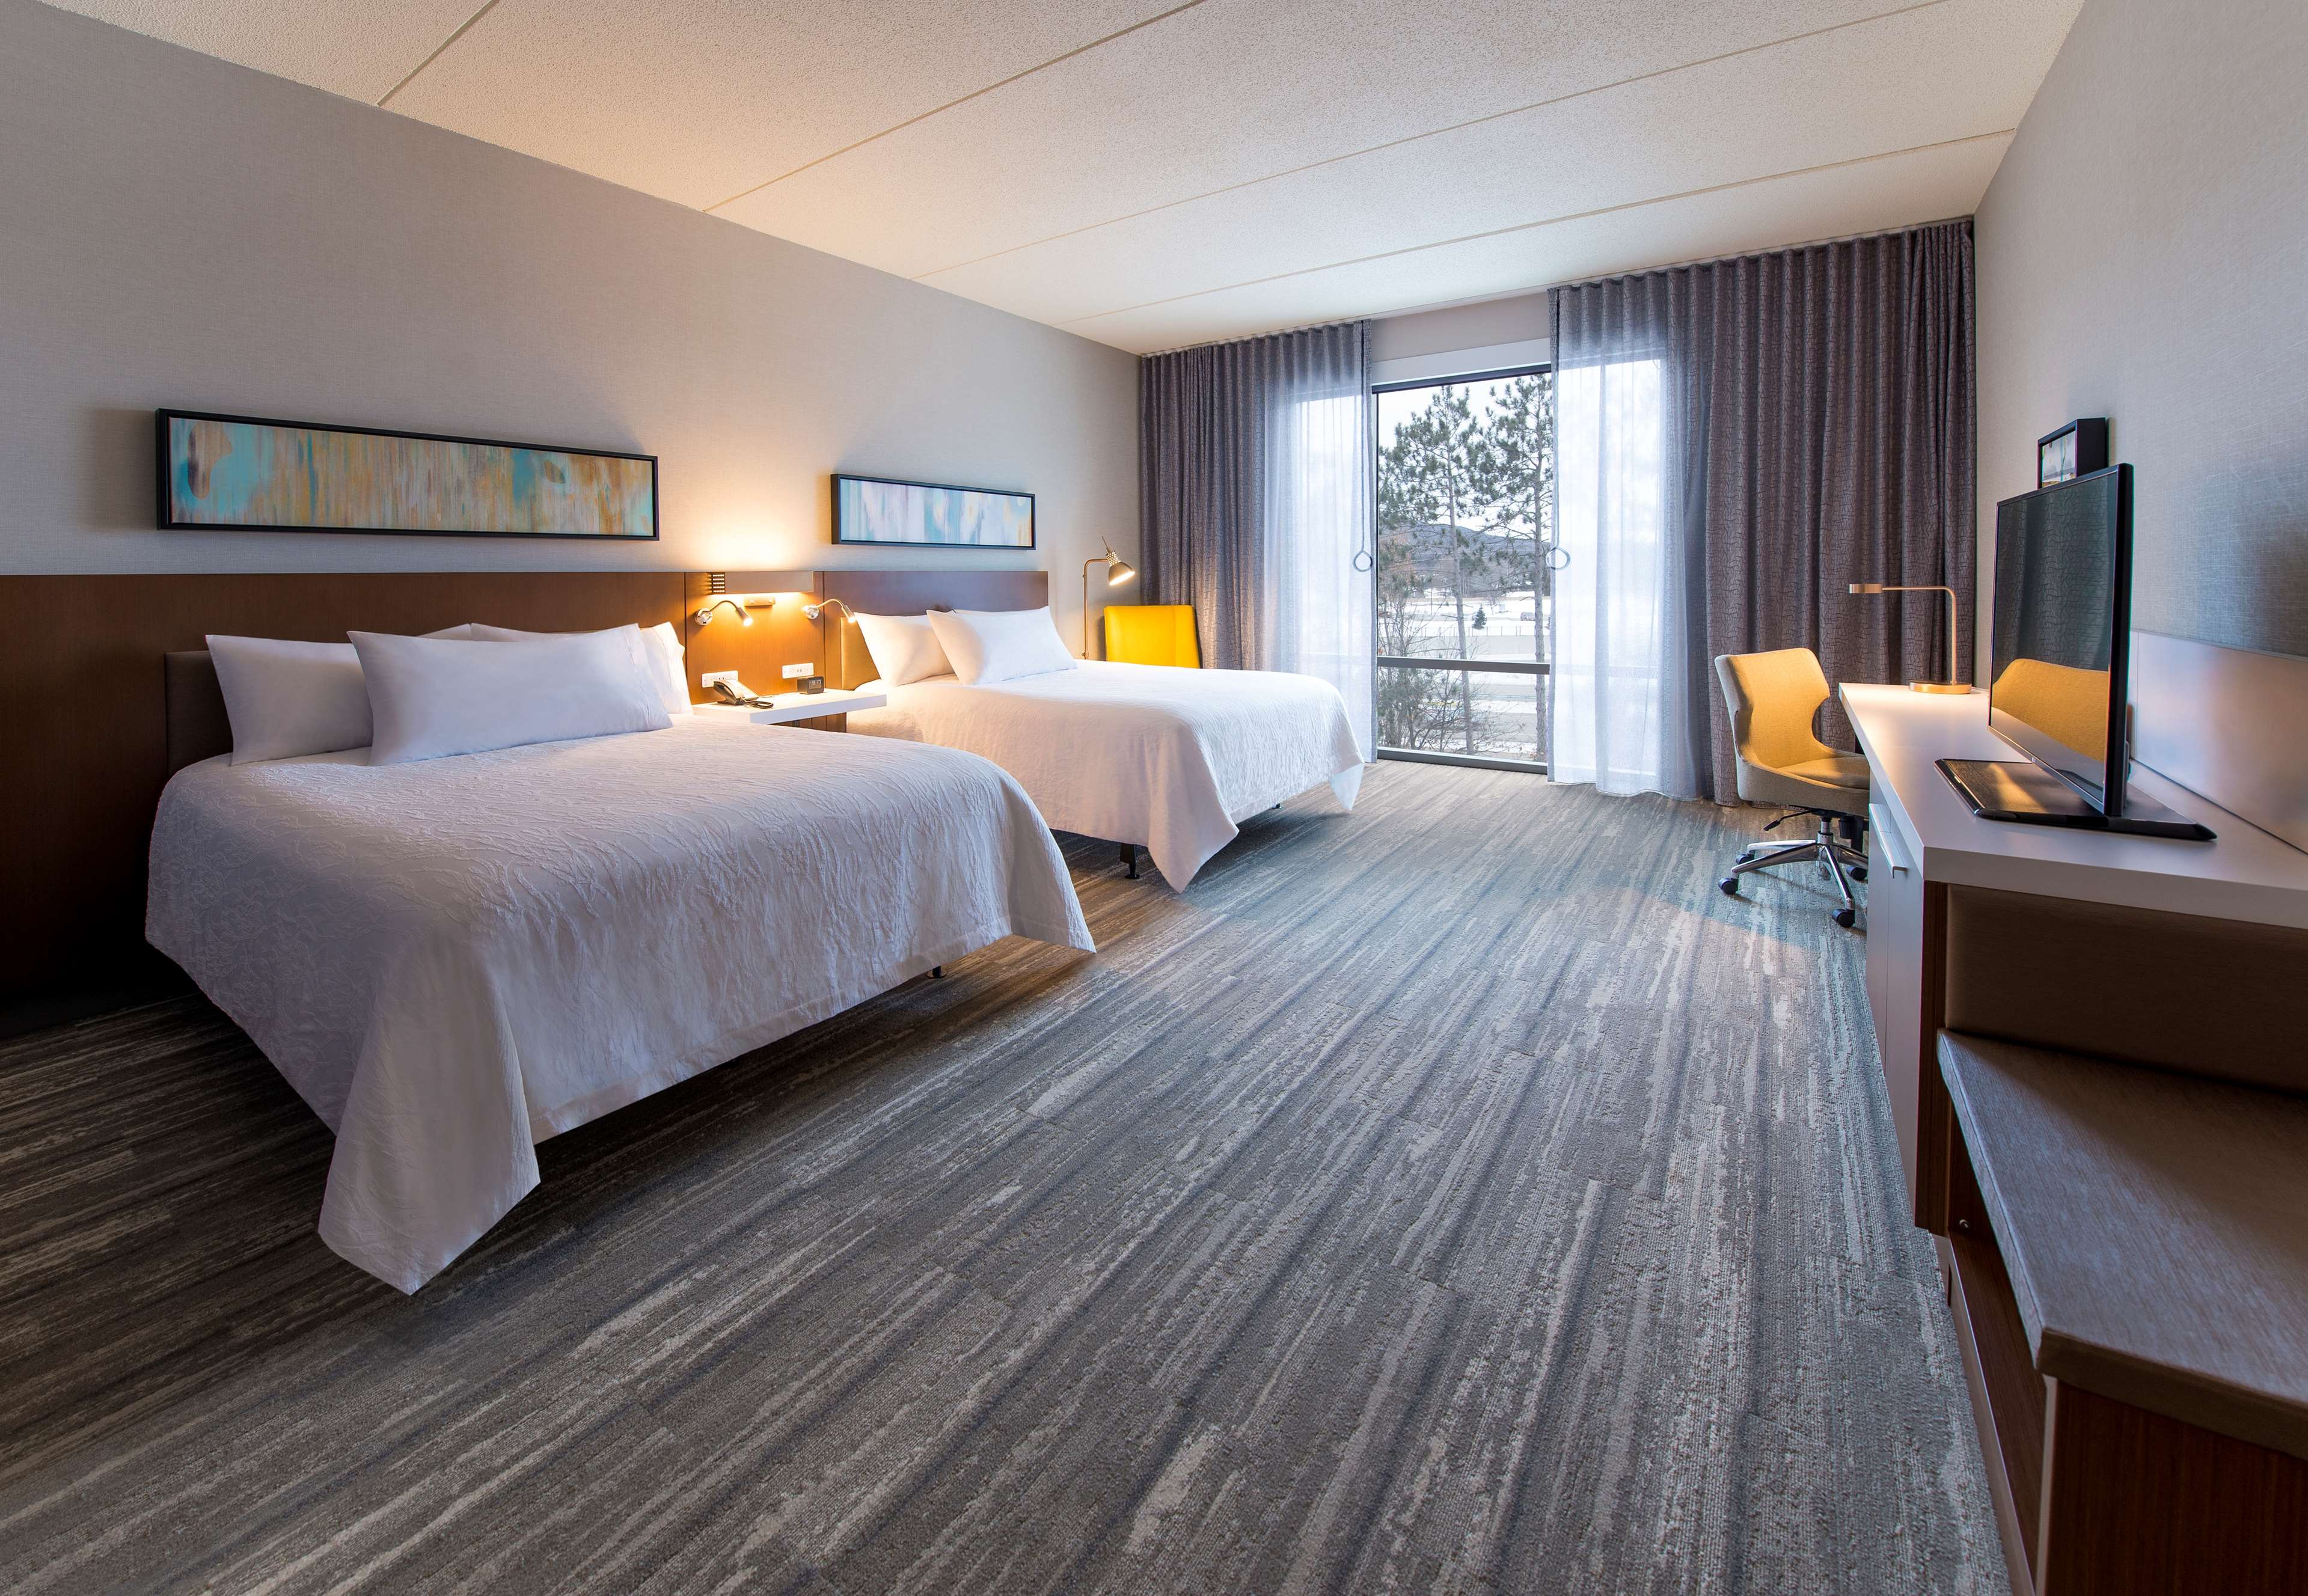 Hilton Garden Inn Wausau image 11